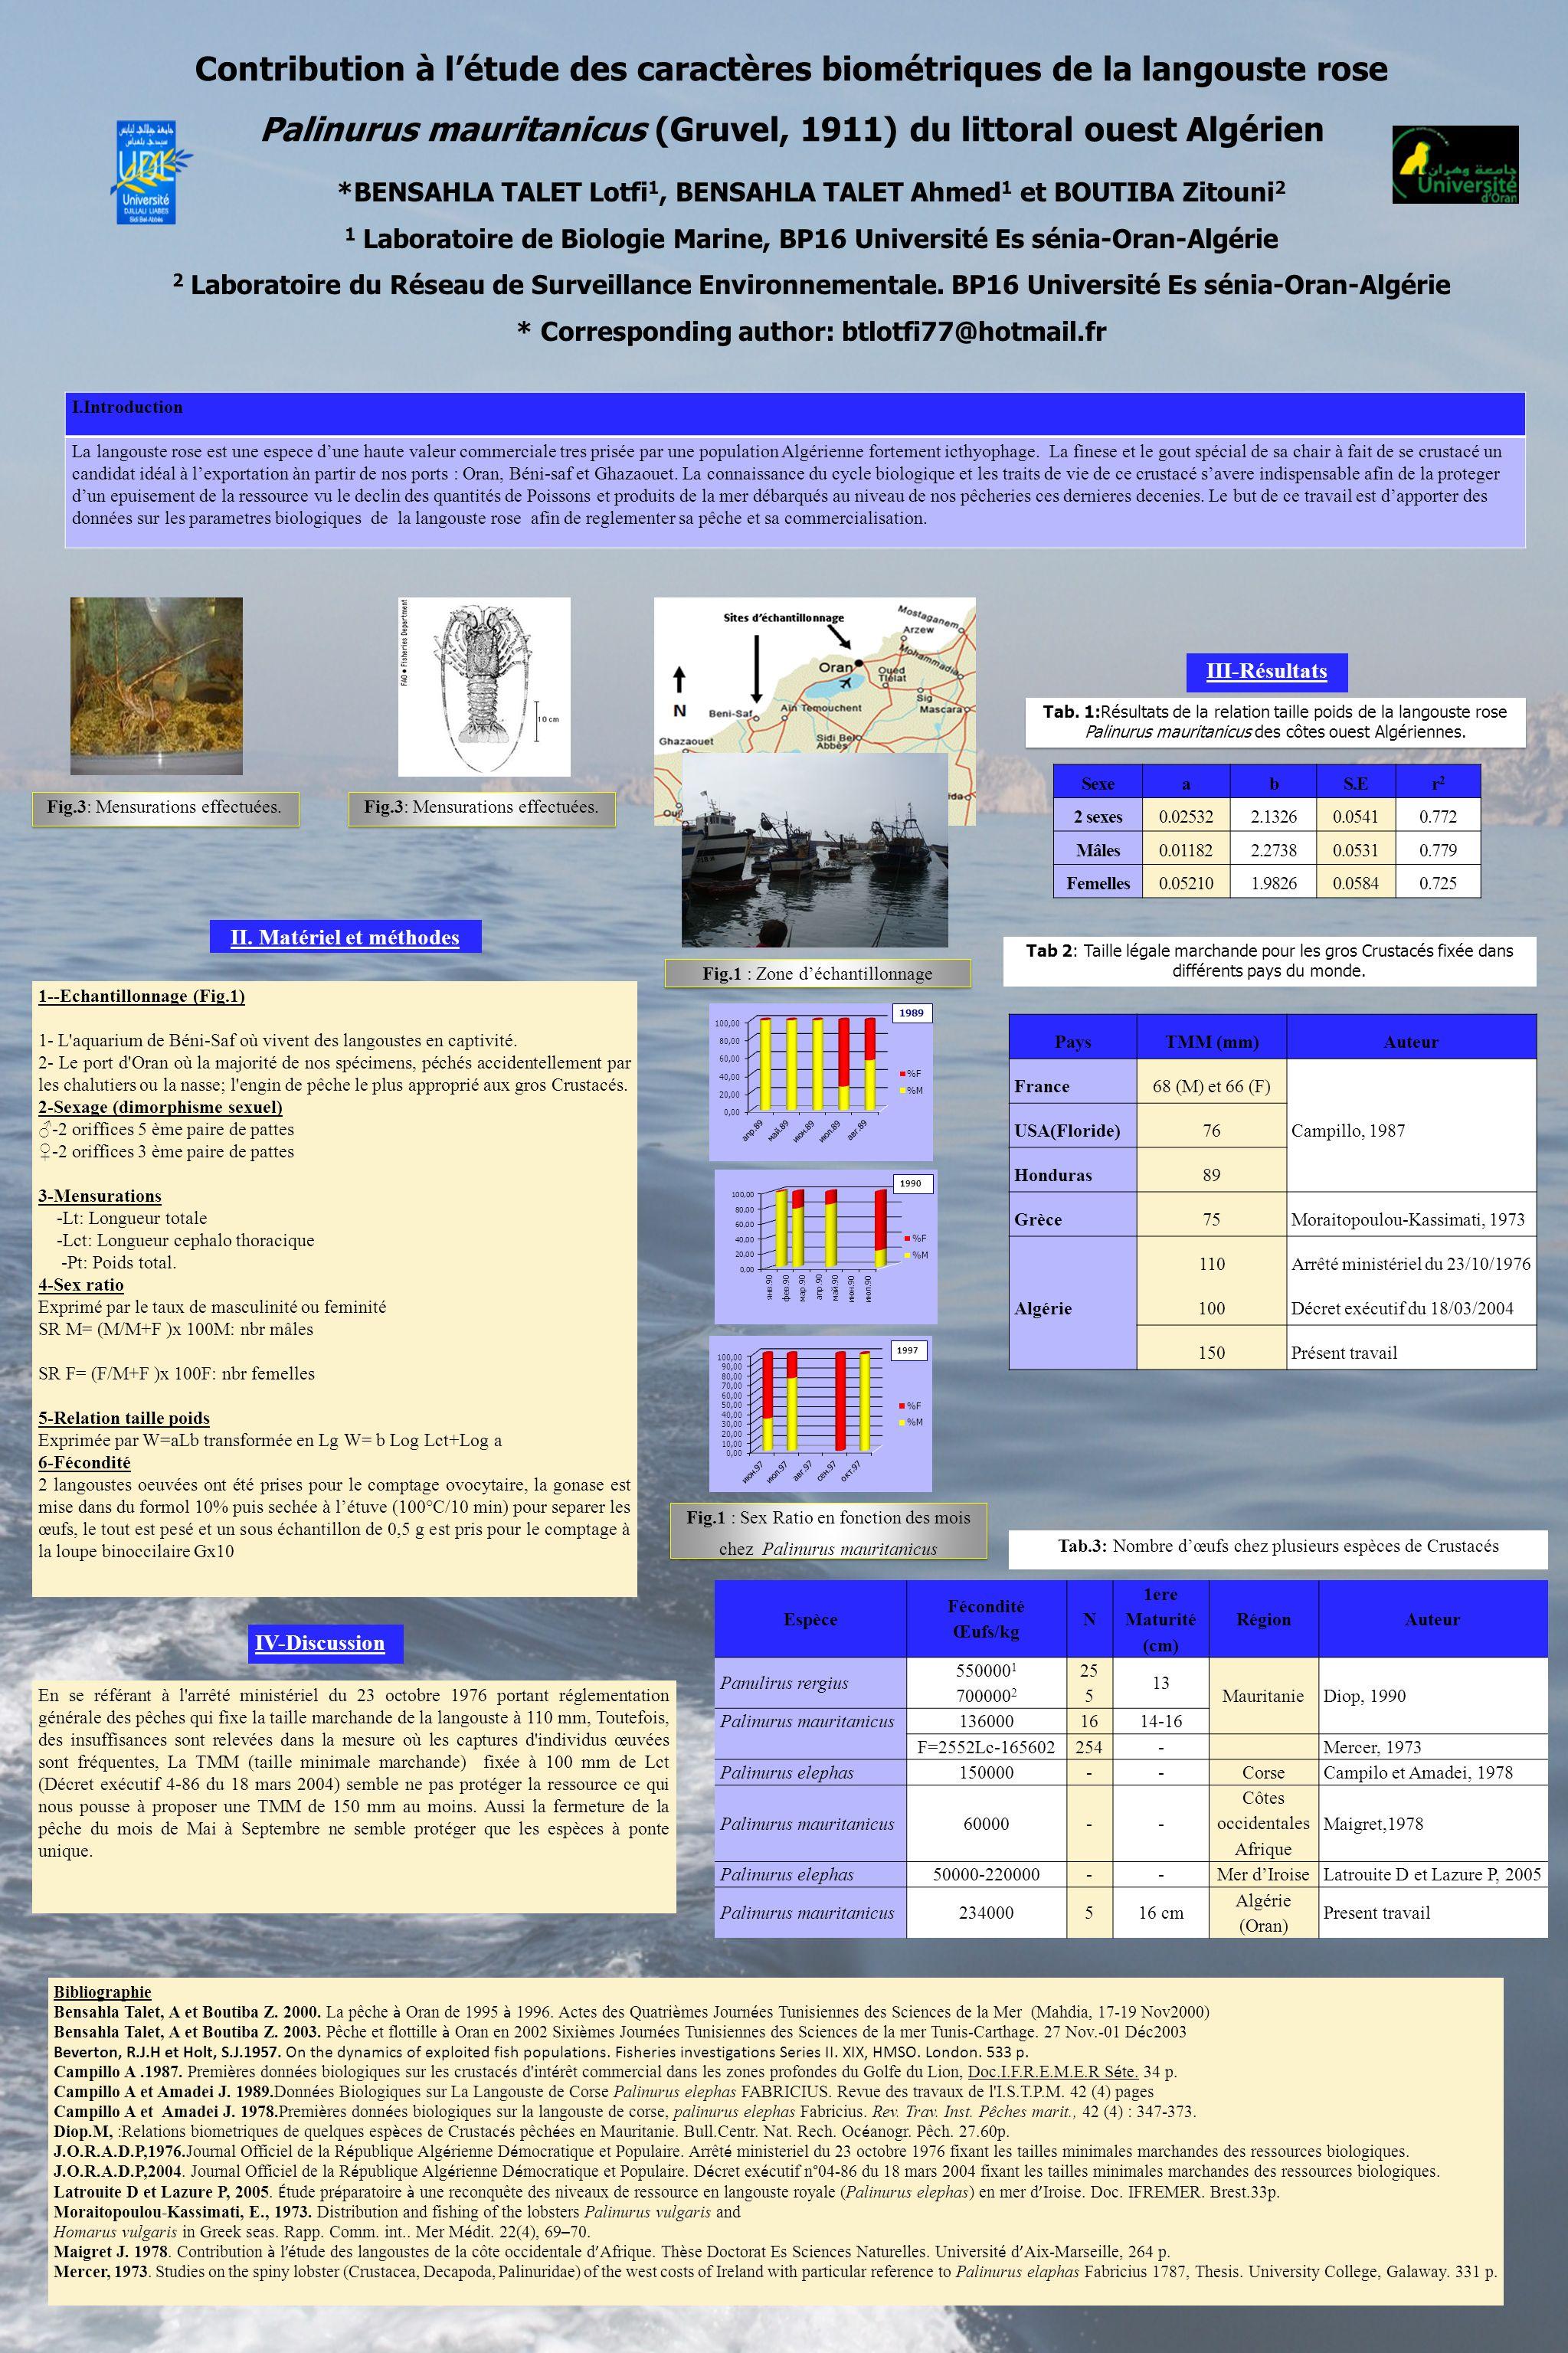 *BENSAHLA TALET Lotfi 1, BENSAHLA TALET Ahmed 1 et BOUTIBA Zitouni 2 1 Laboratoire de Biologie Marine, BP16 Université Es sénia-Oran-Algérie 2 Laborat